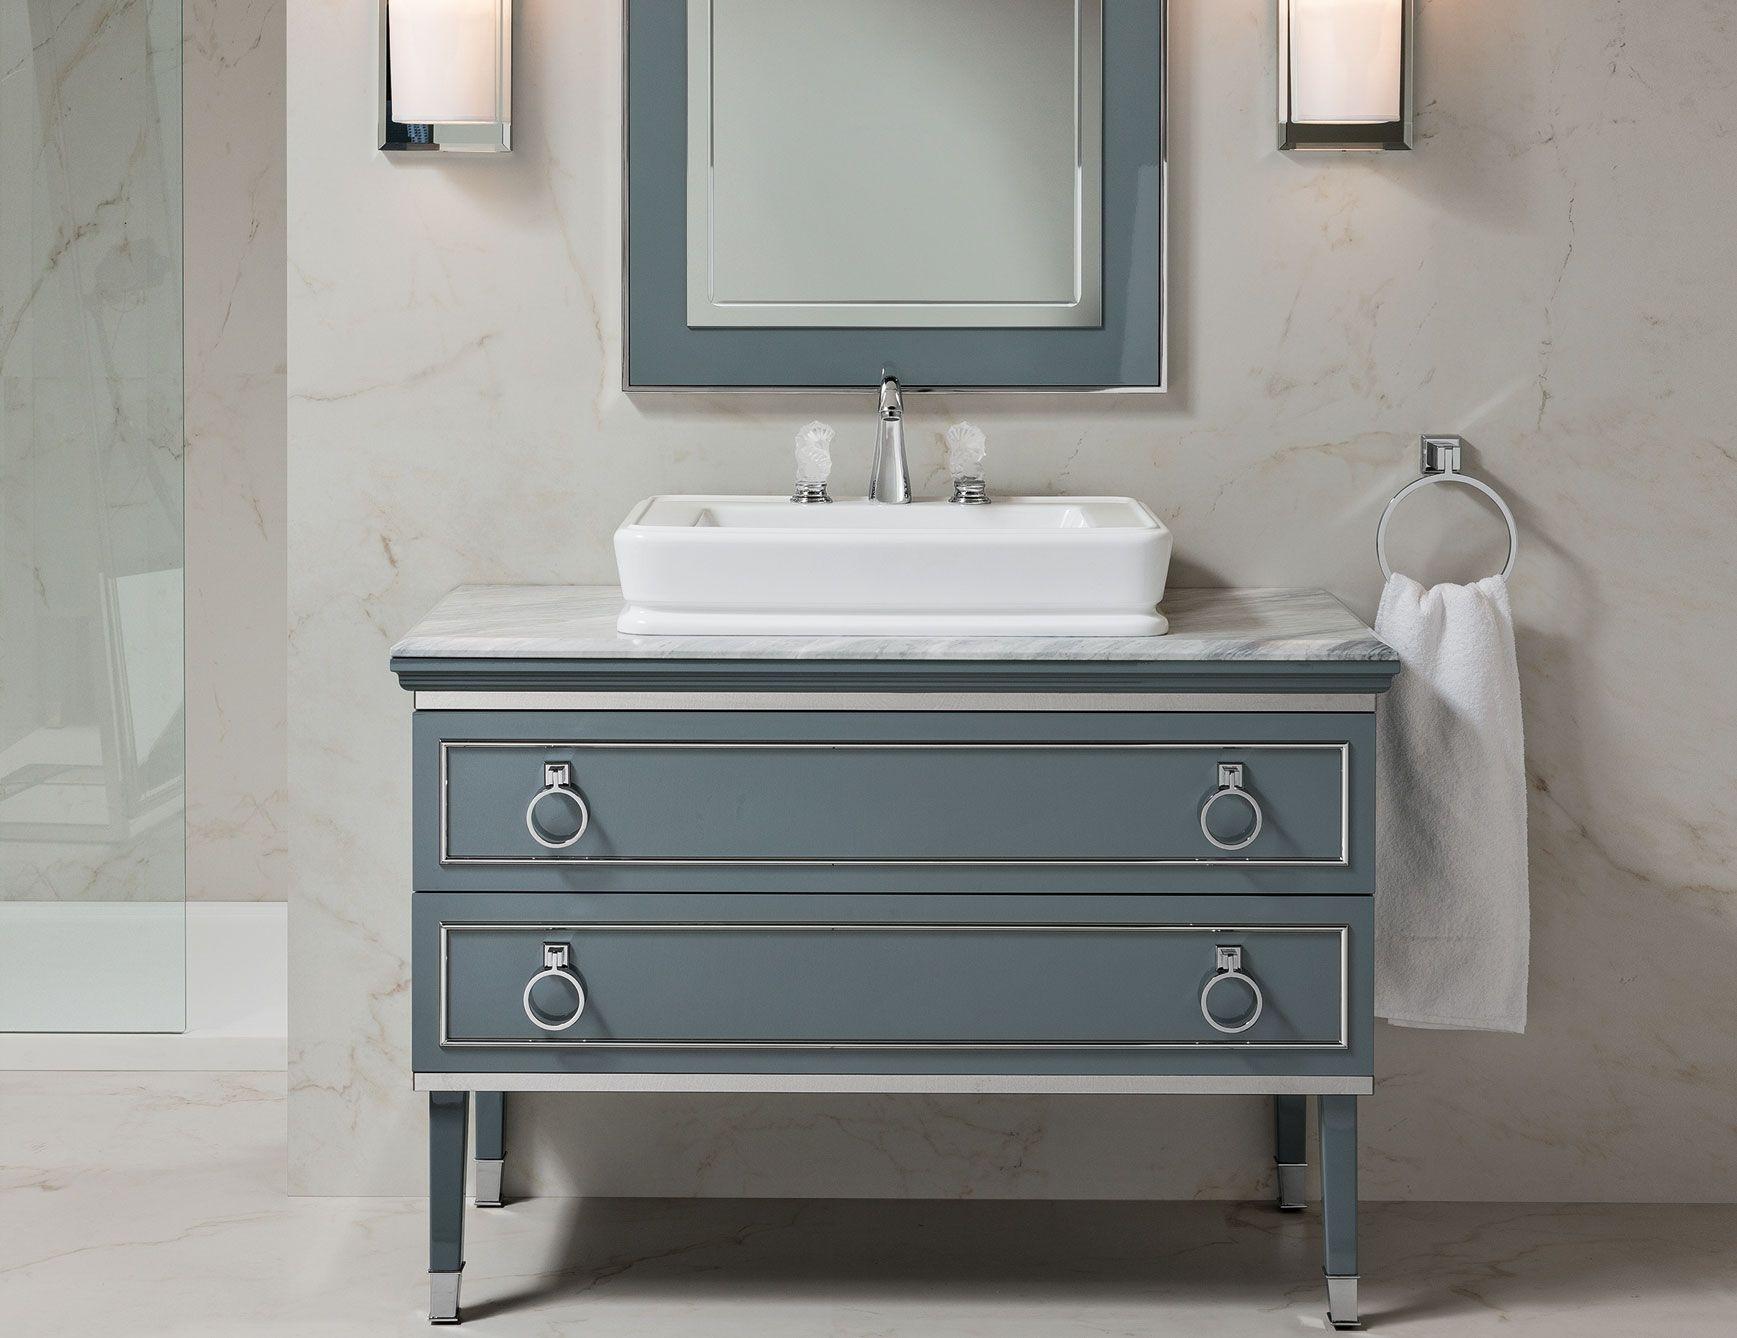 Lutetia L17 luxury classic Italian bathroom vanity inspired by Art